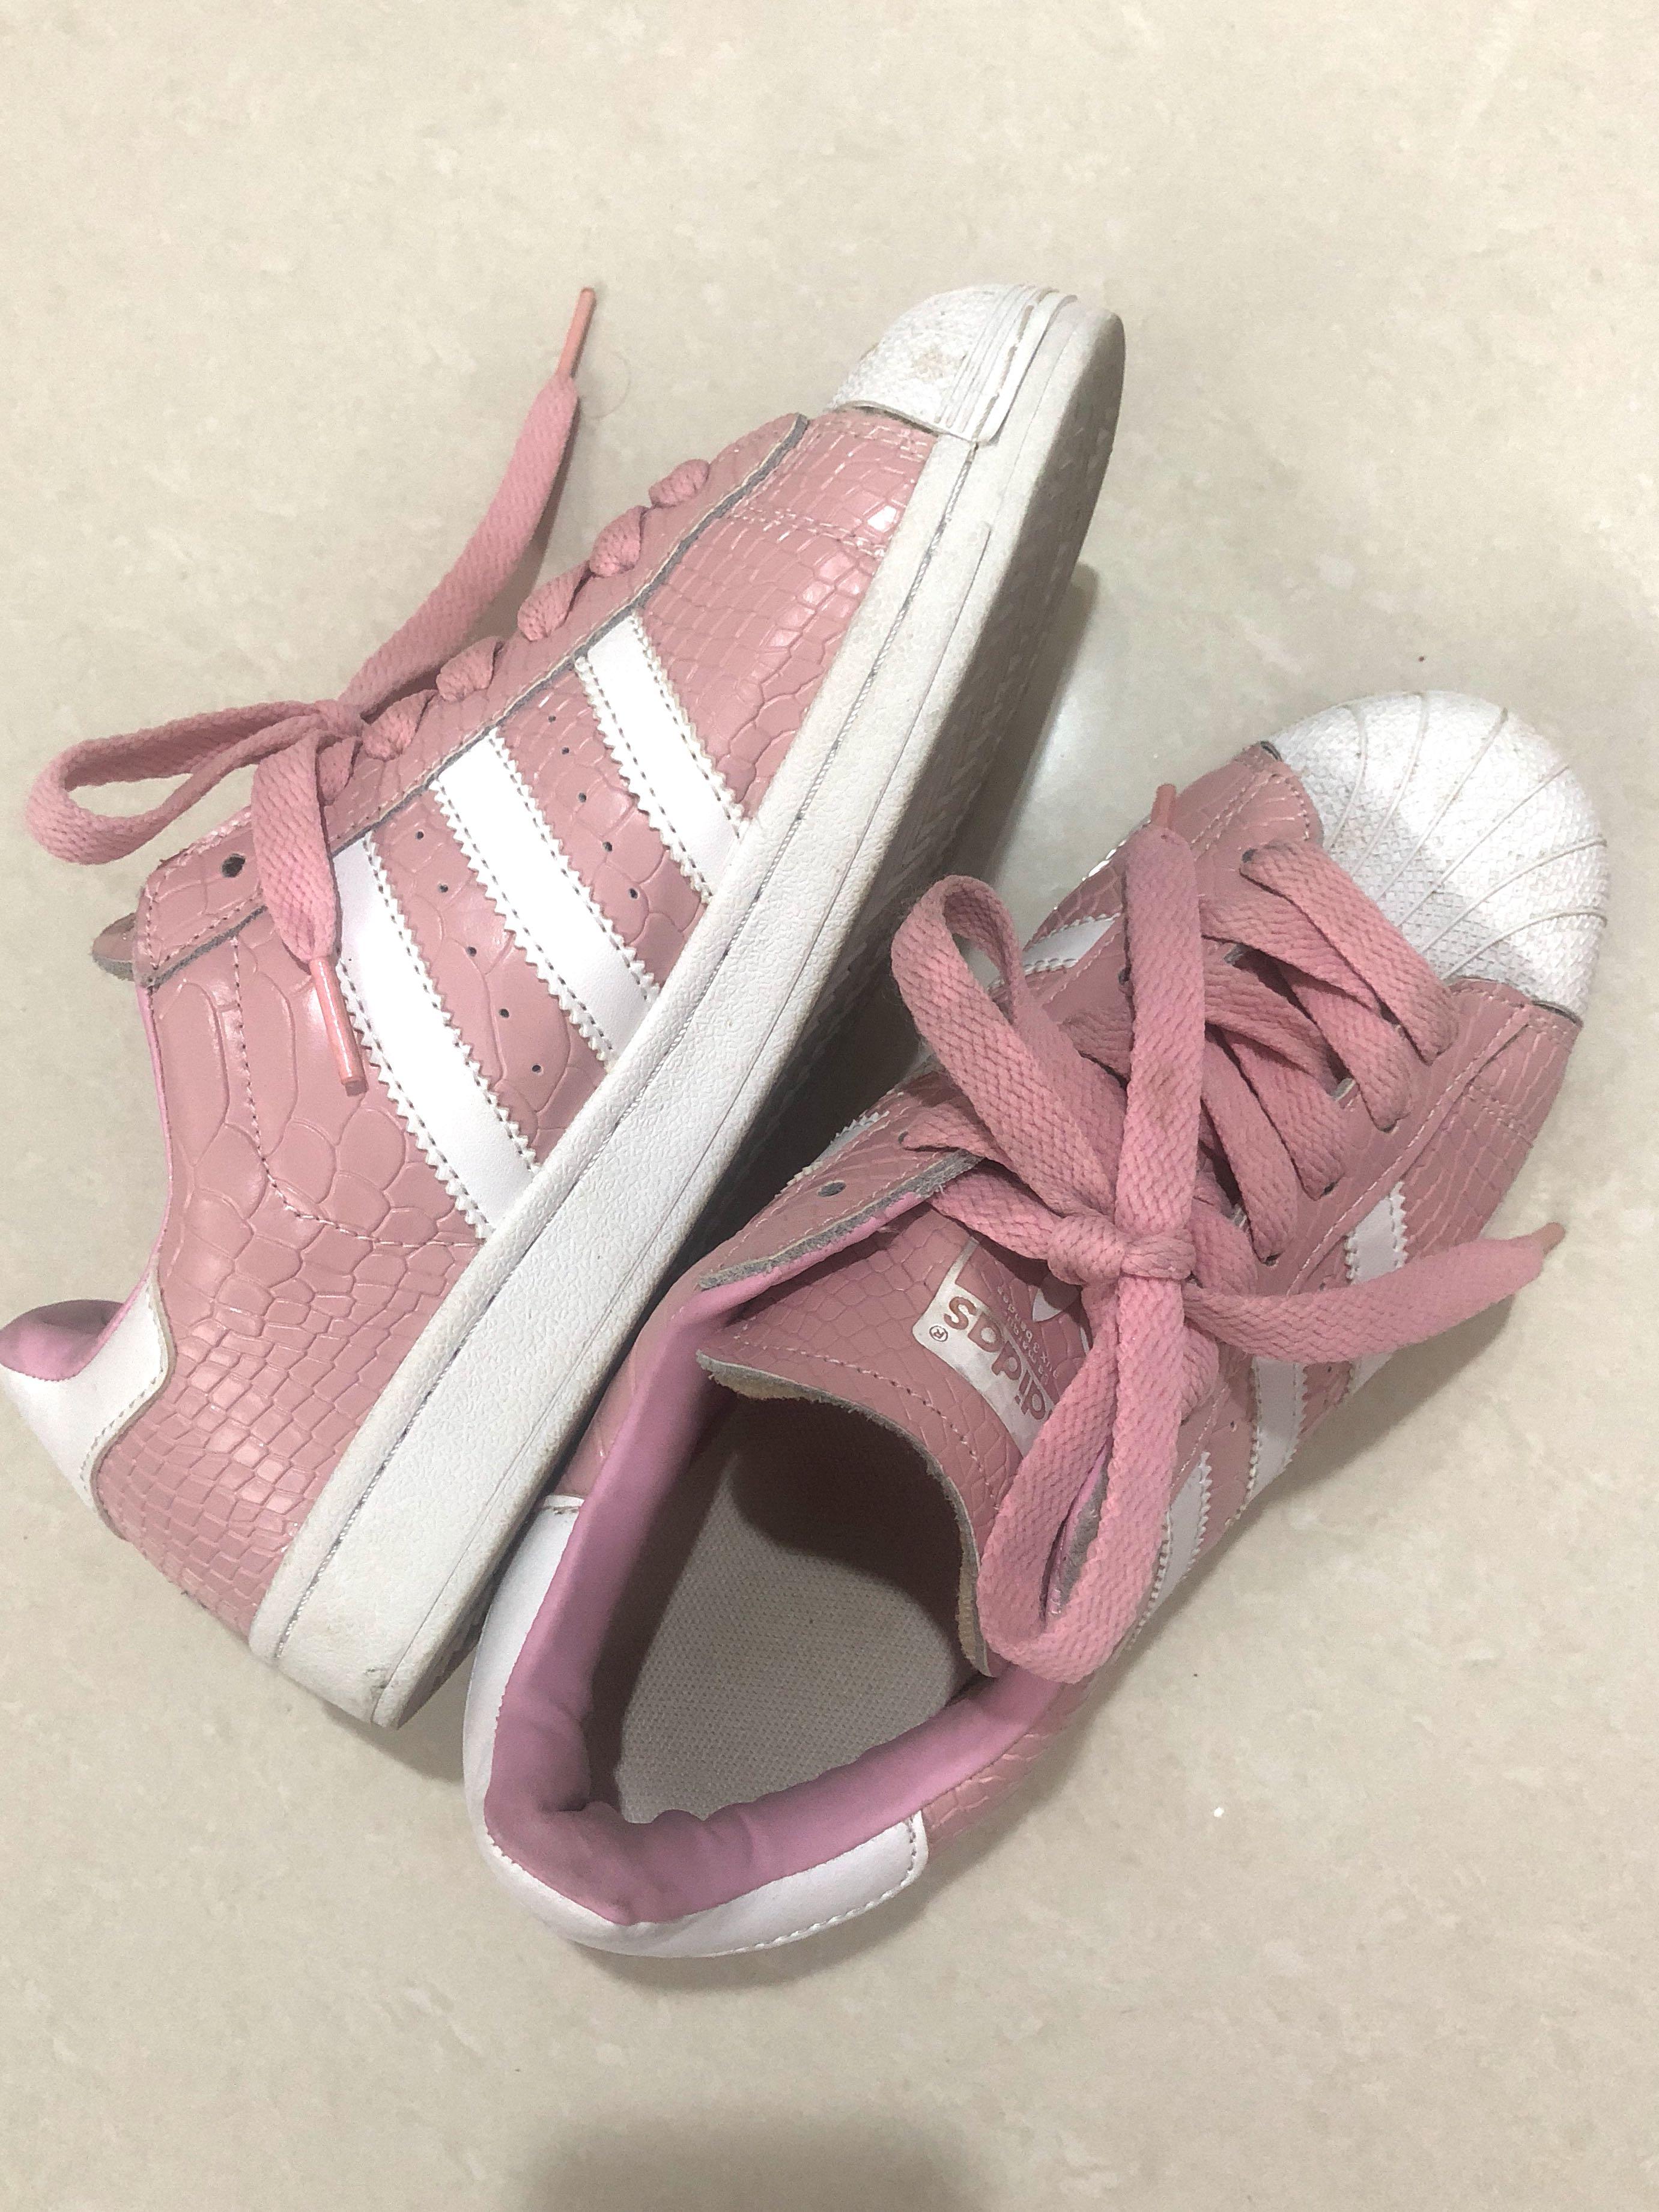 Adidas Superstar Pink Snake Skin 1 1 Quality 811d84b9aa39